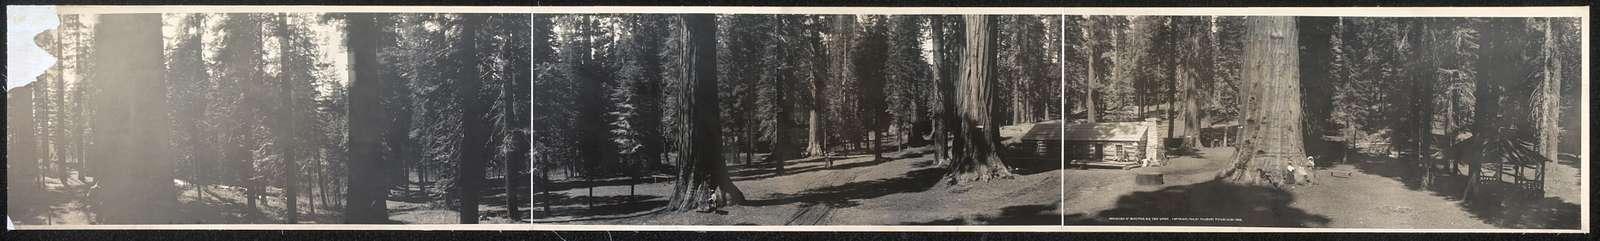 Panorama of Mariposa Big Tree Grove